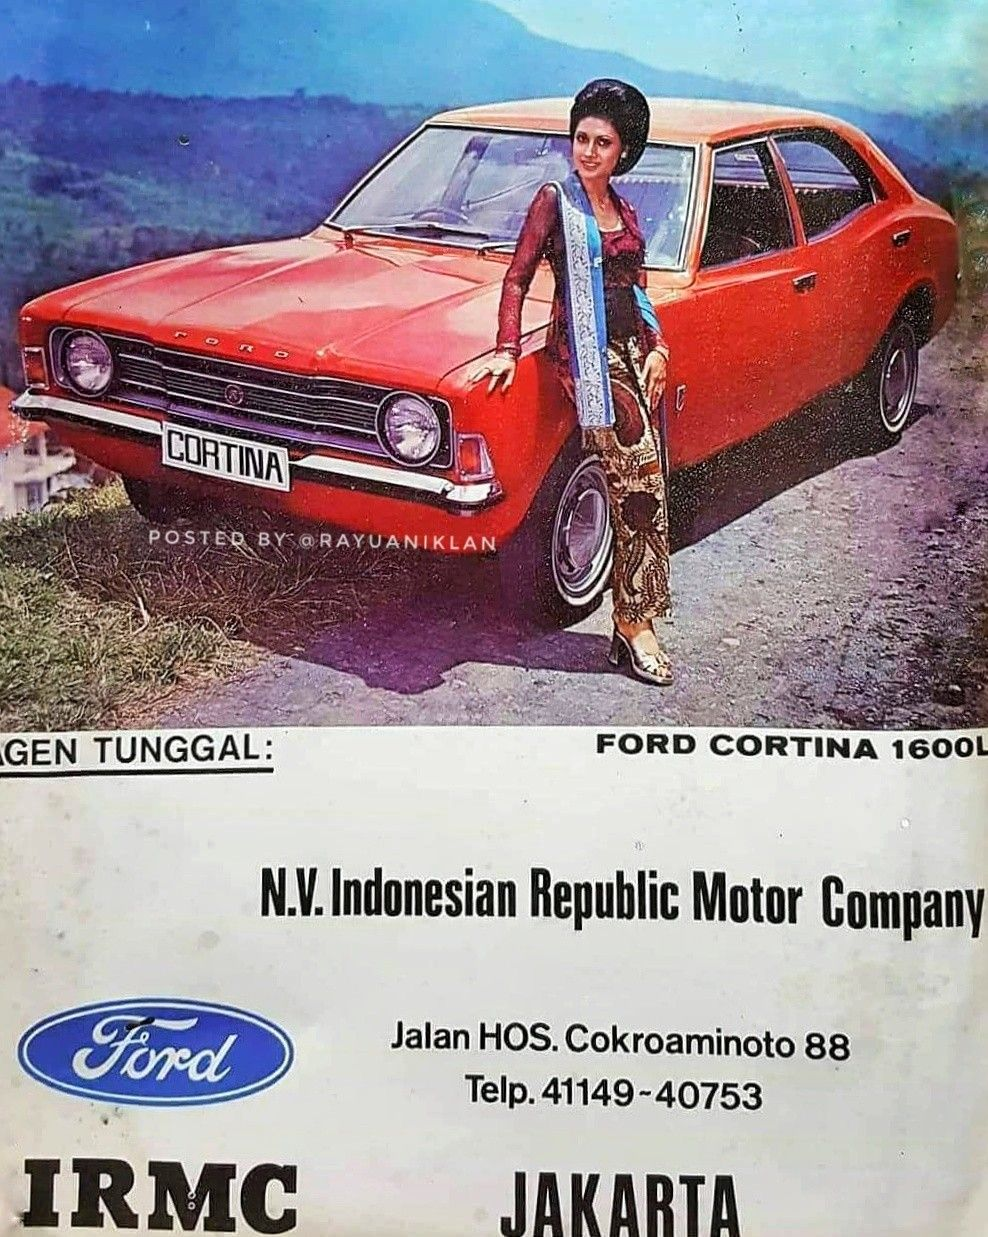 Ford Cortina 1600l Print Ads Ads Ford